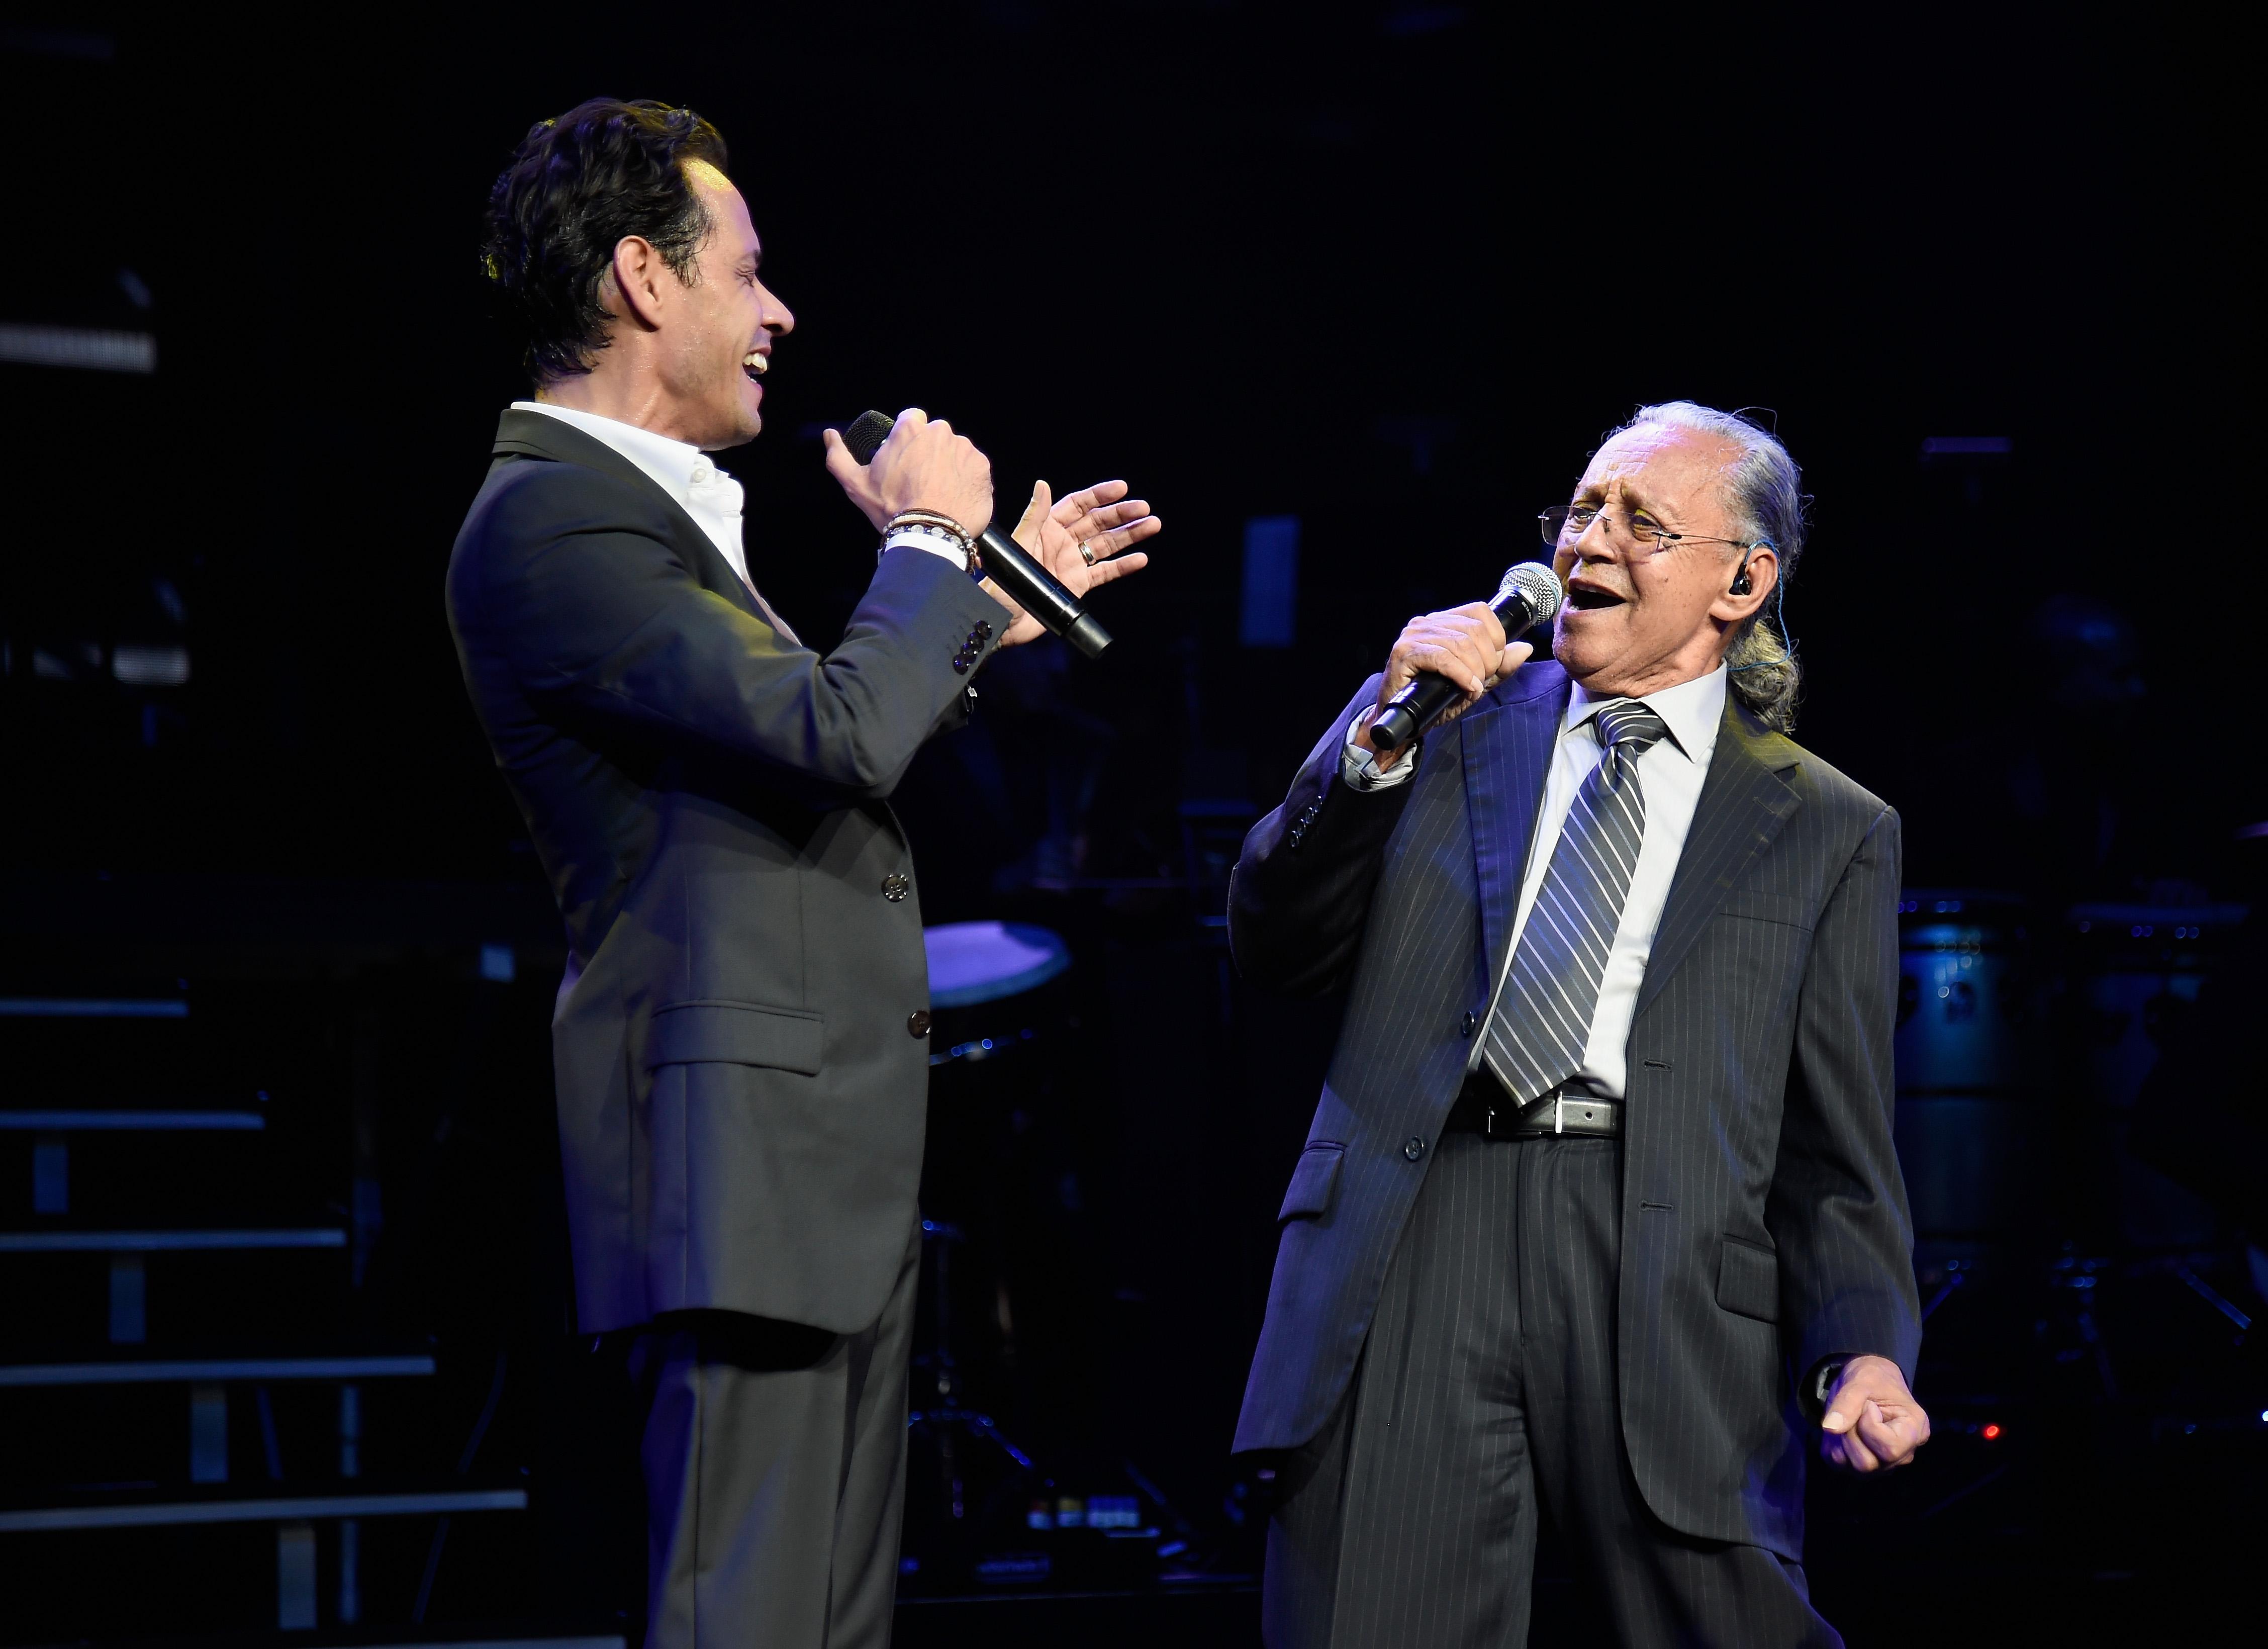 Marc Anthony y su papá Felipe Muniz